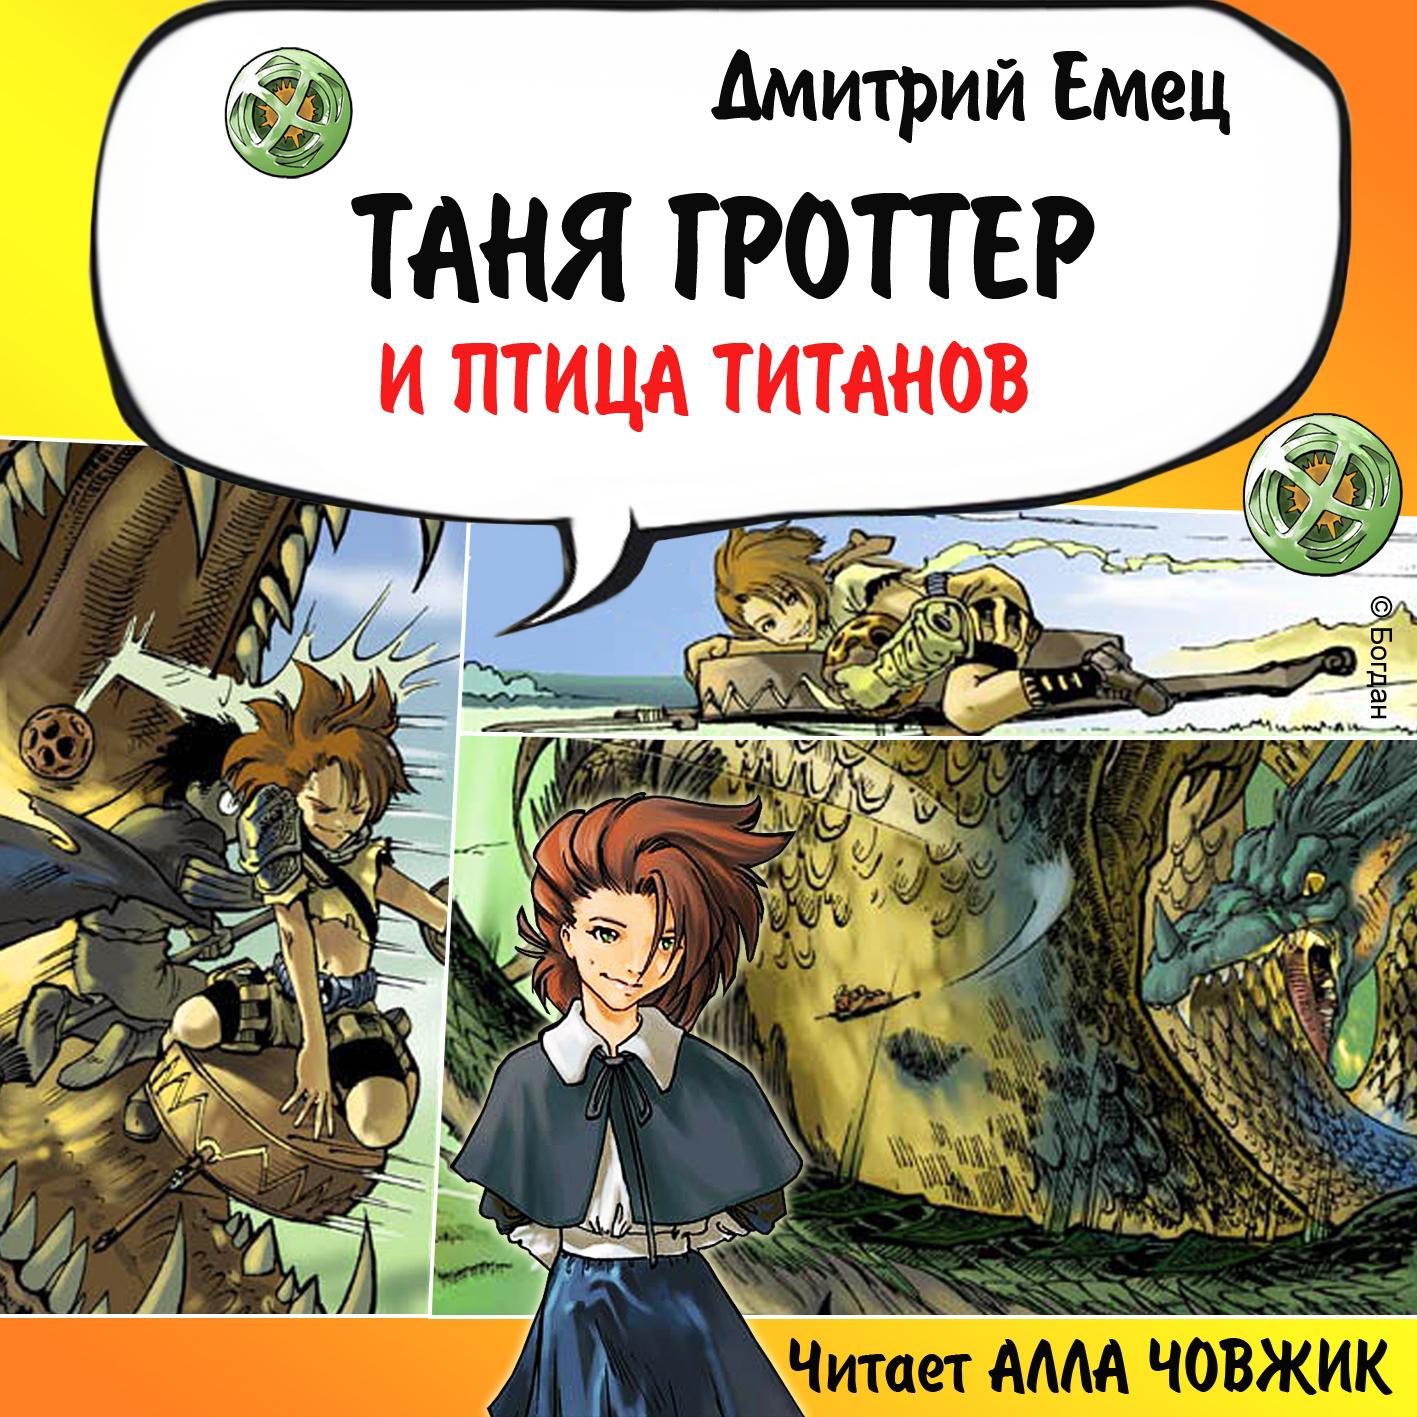 Дмитрий Емец Таня Гроттер и птица титанов емец д таня гроттер и птица титанов